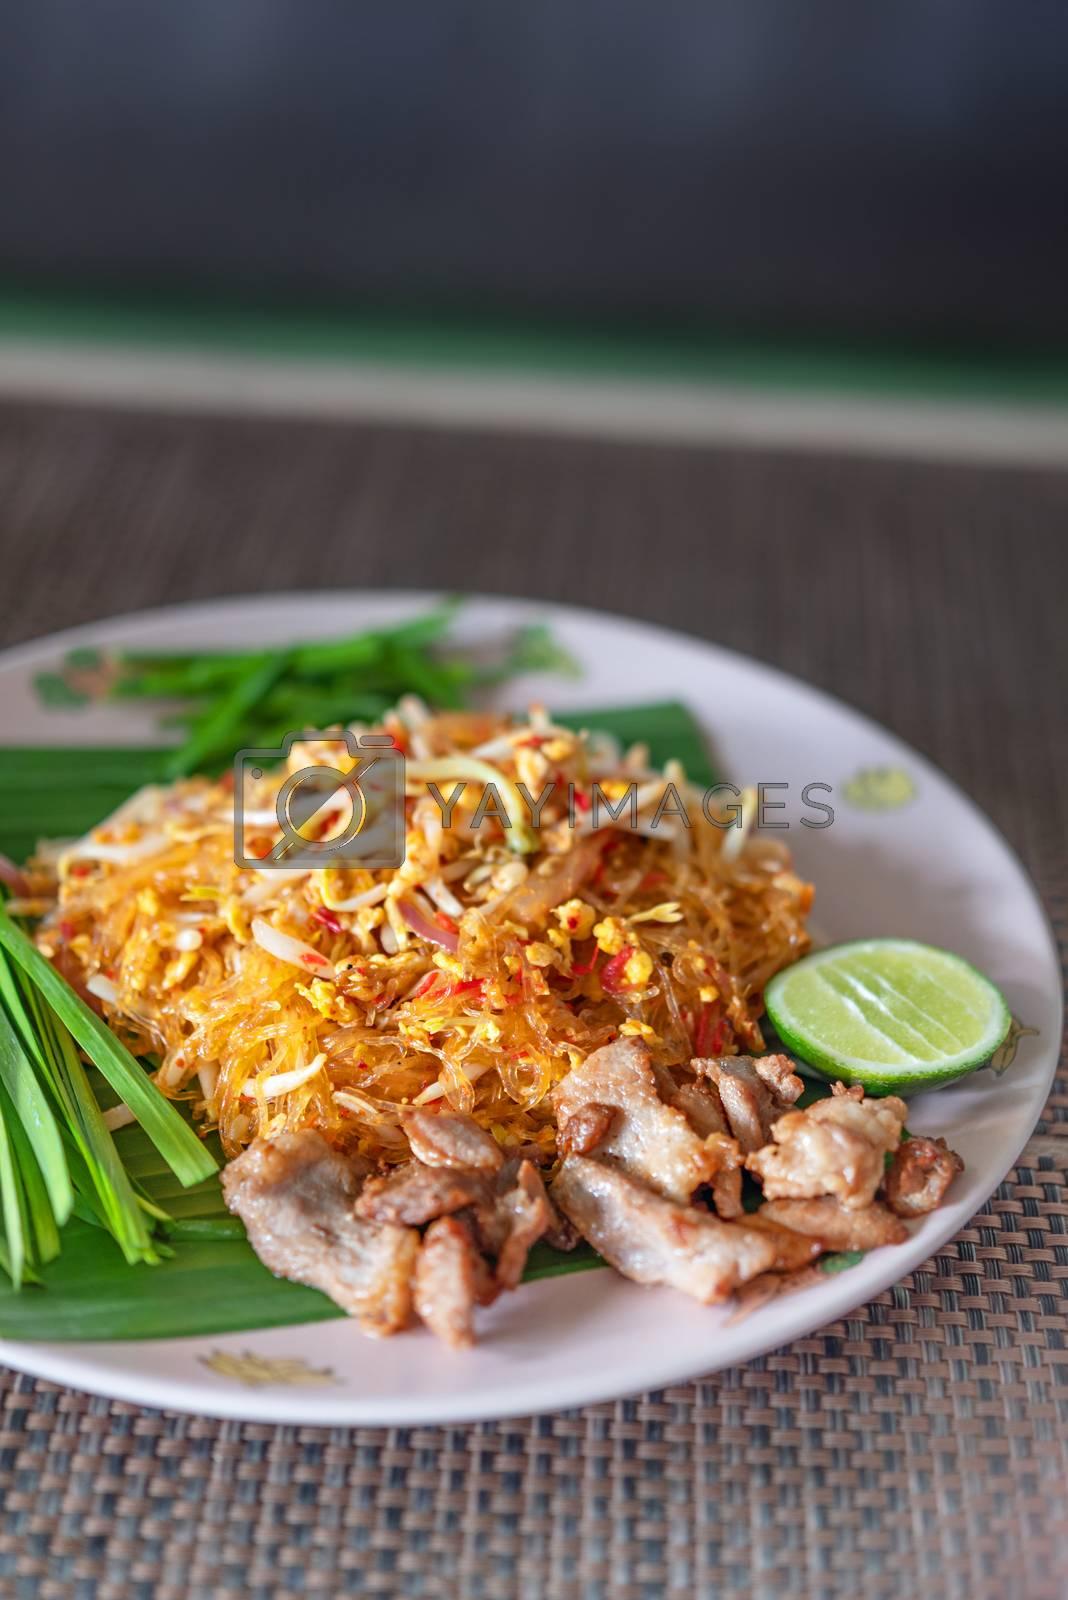 Royalty free image of stir fry noodles with pork by rakratchada